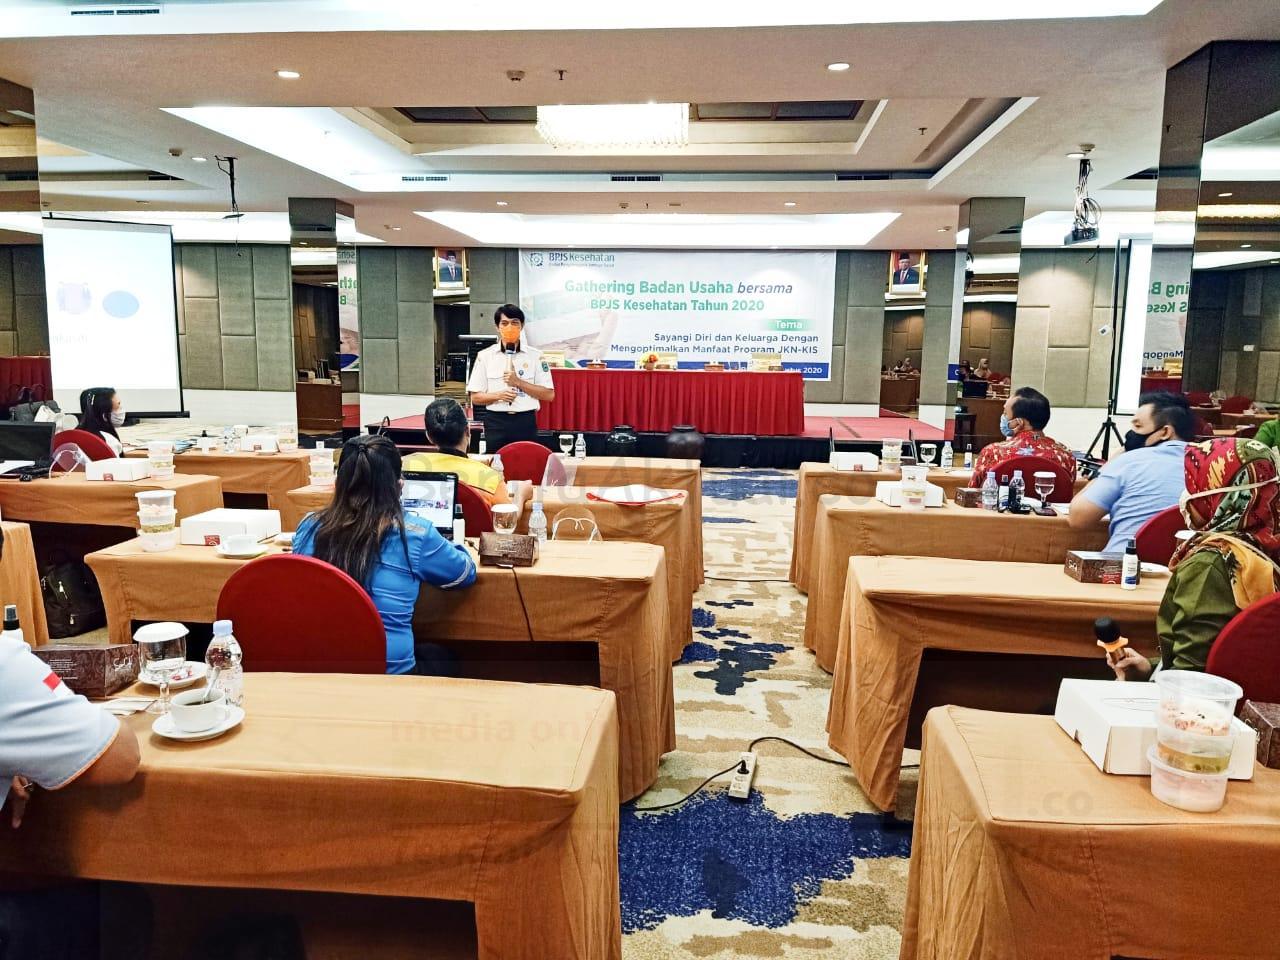 Optimalkan JKN-KIS, 53 Perusahaan di Manokwari Ikut Gathering BPJS Kesehatan 15 IMG 20200819 WA0031